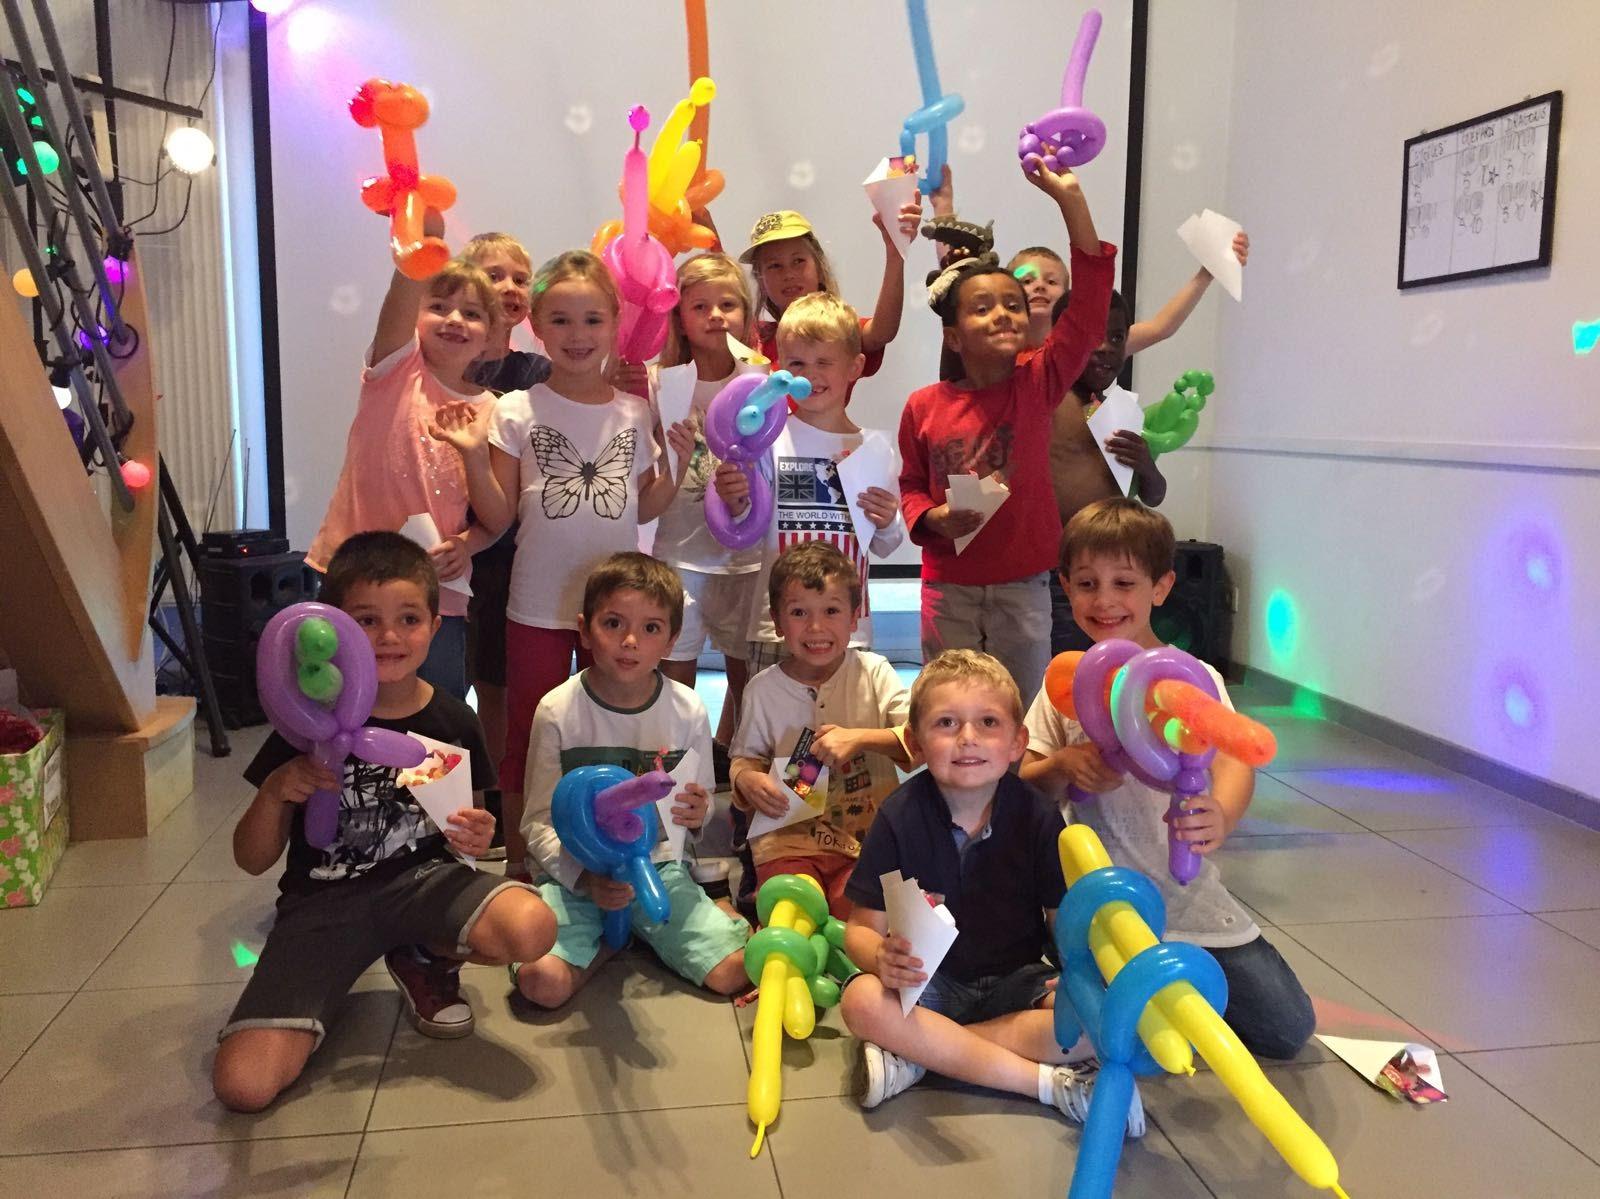 Les Petits Artisans : ballons